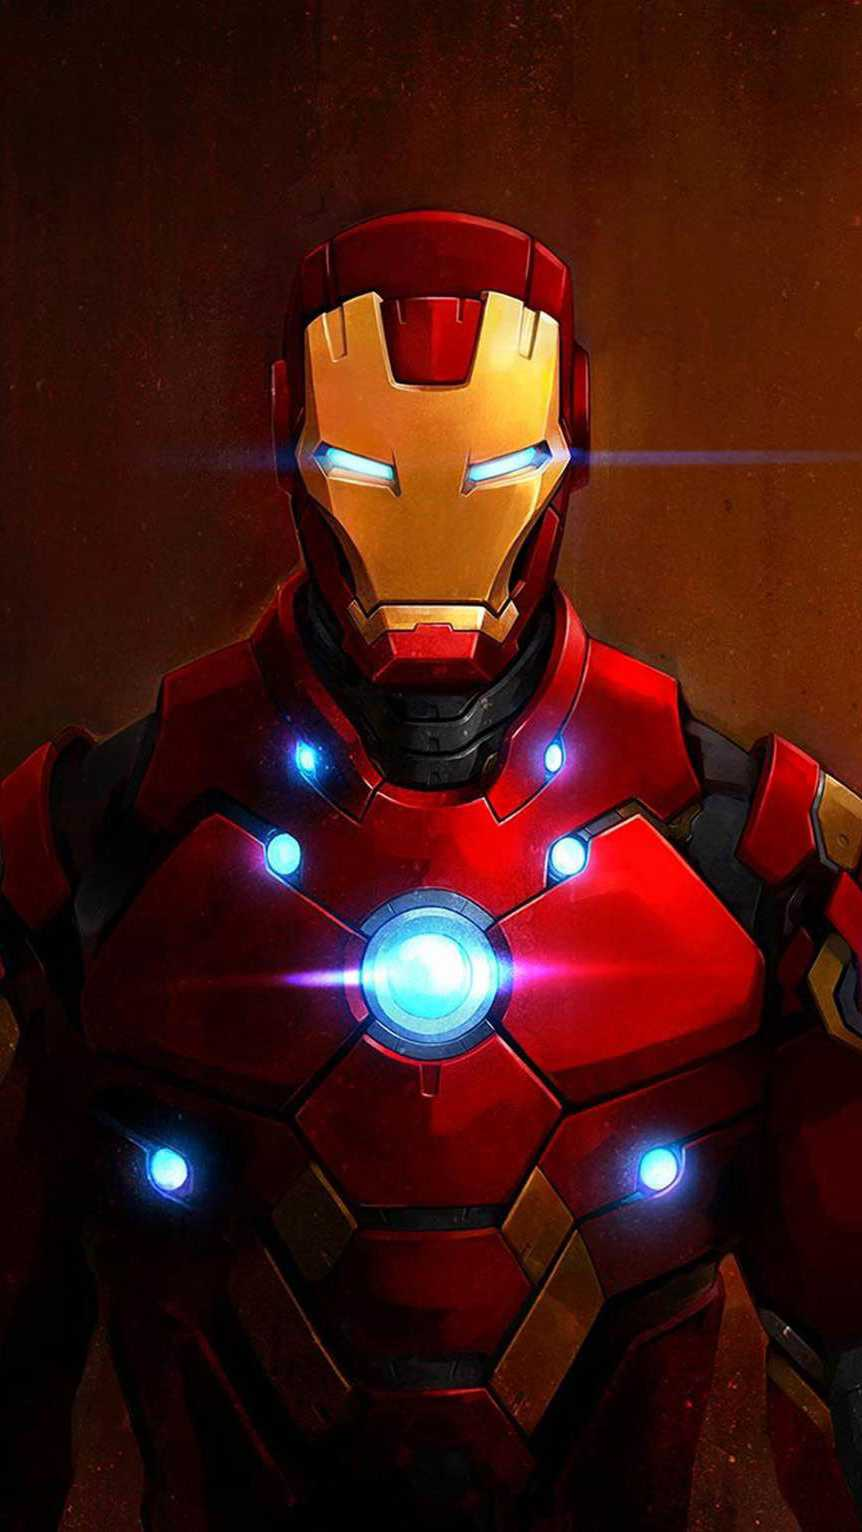 Animated Christmas Desktop Wallpaper Red Iron Man Iphone Wallpaper Iphone Wallpapers